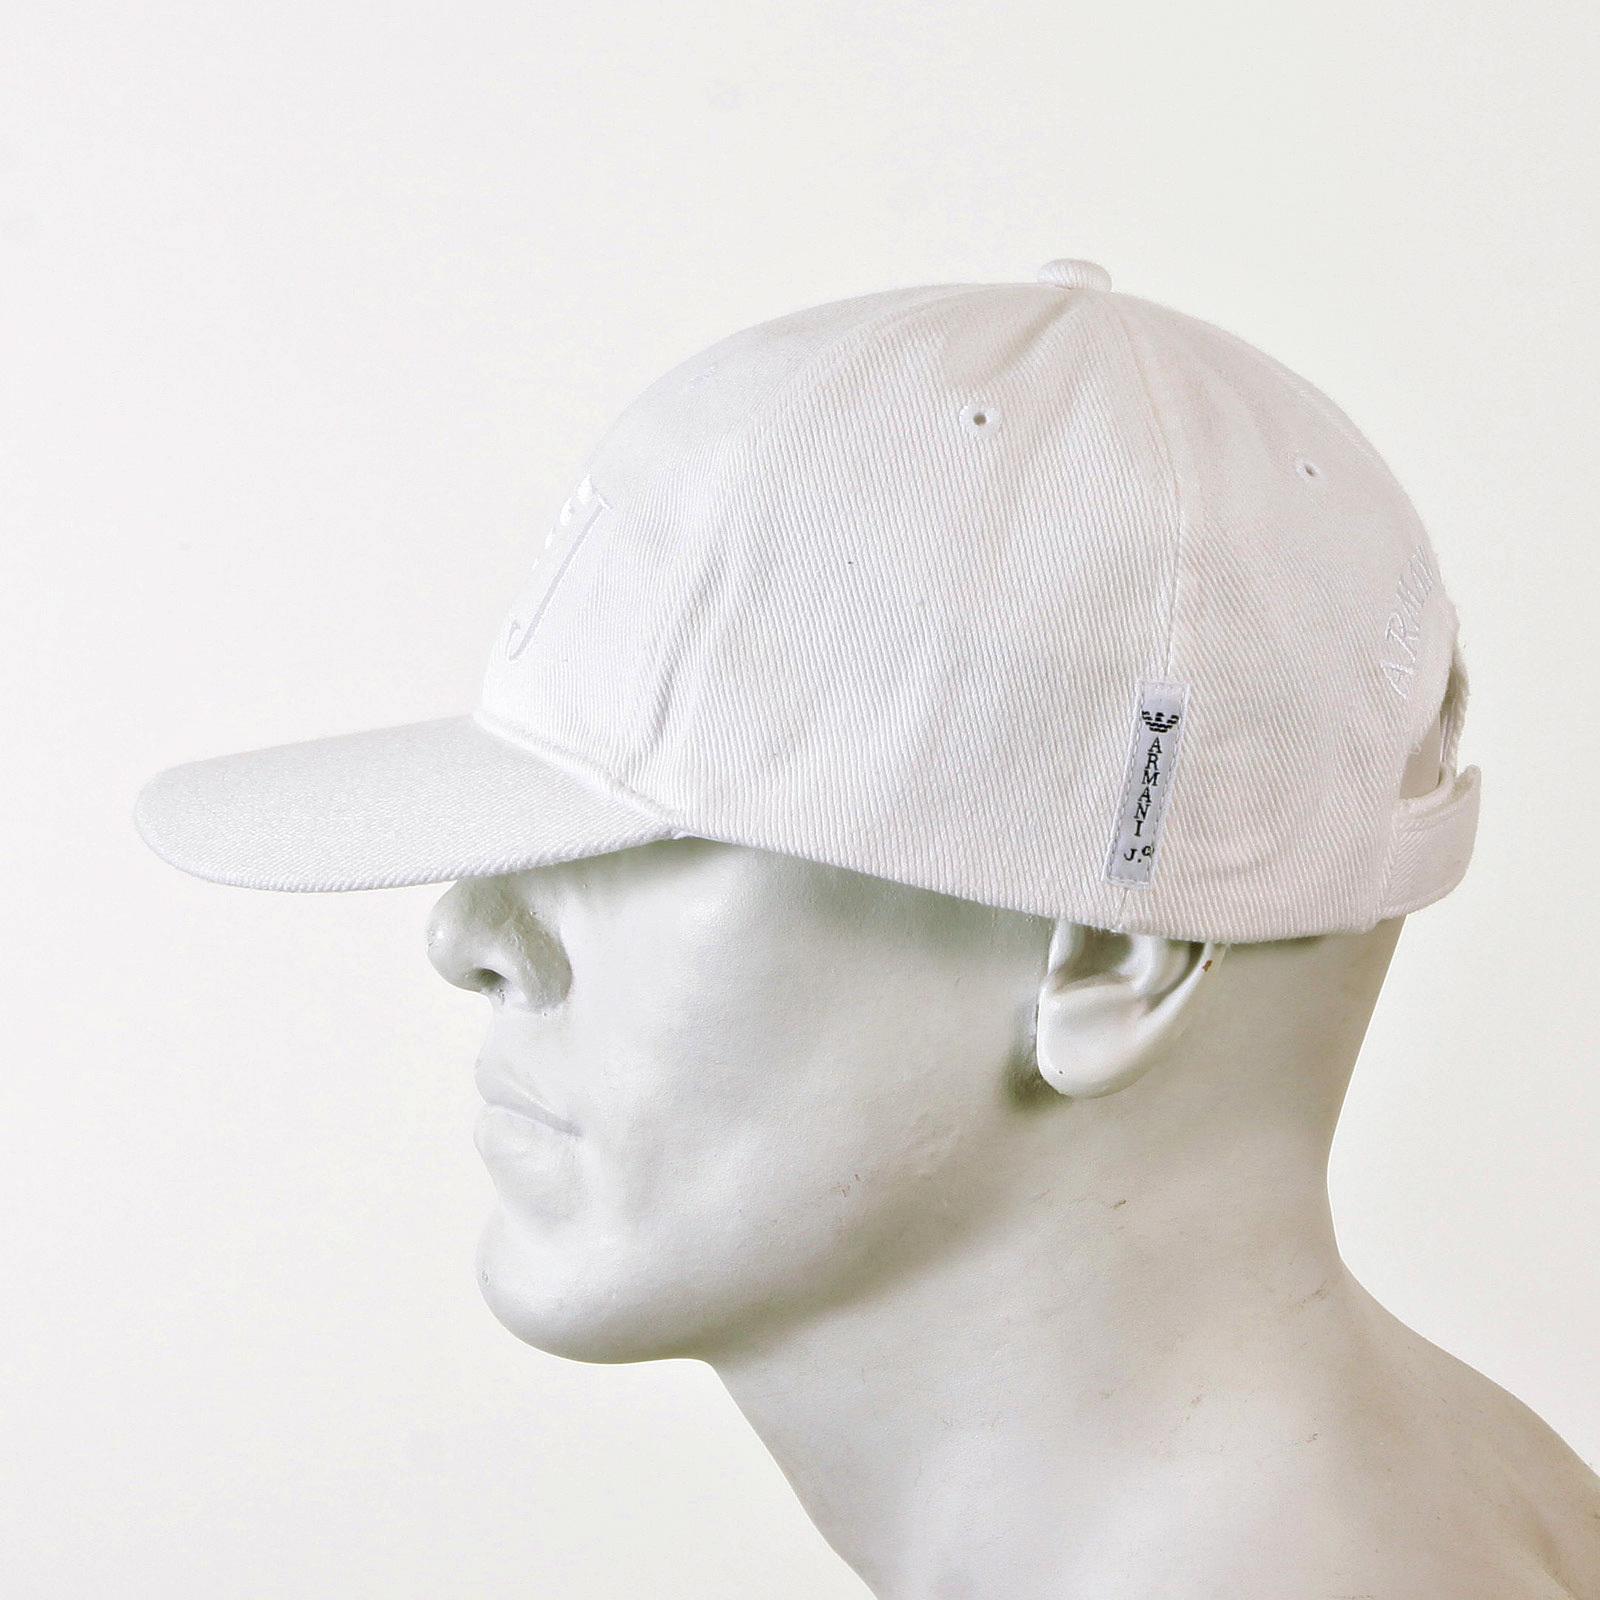 9216c40b7e088a Armani Jeans baseball cap 06481 XE WHITE CAP AJM2265 at Togged Clothing